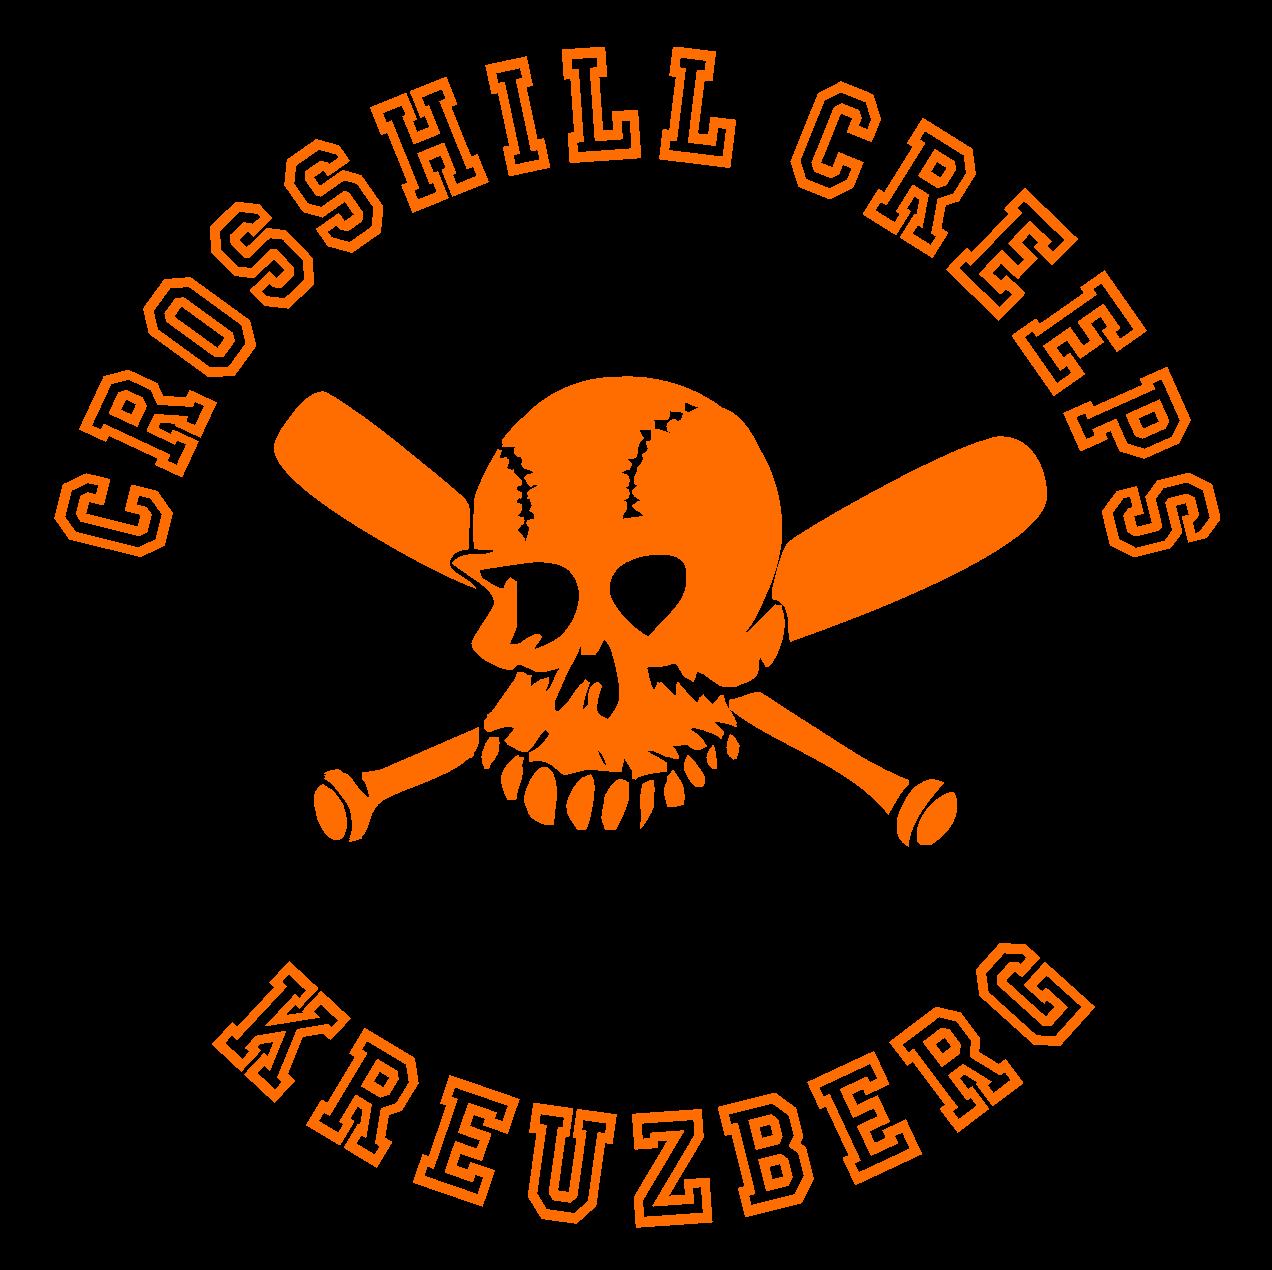 Crosshill Creeps Black